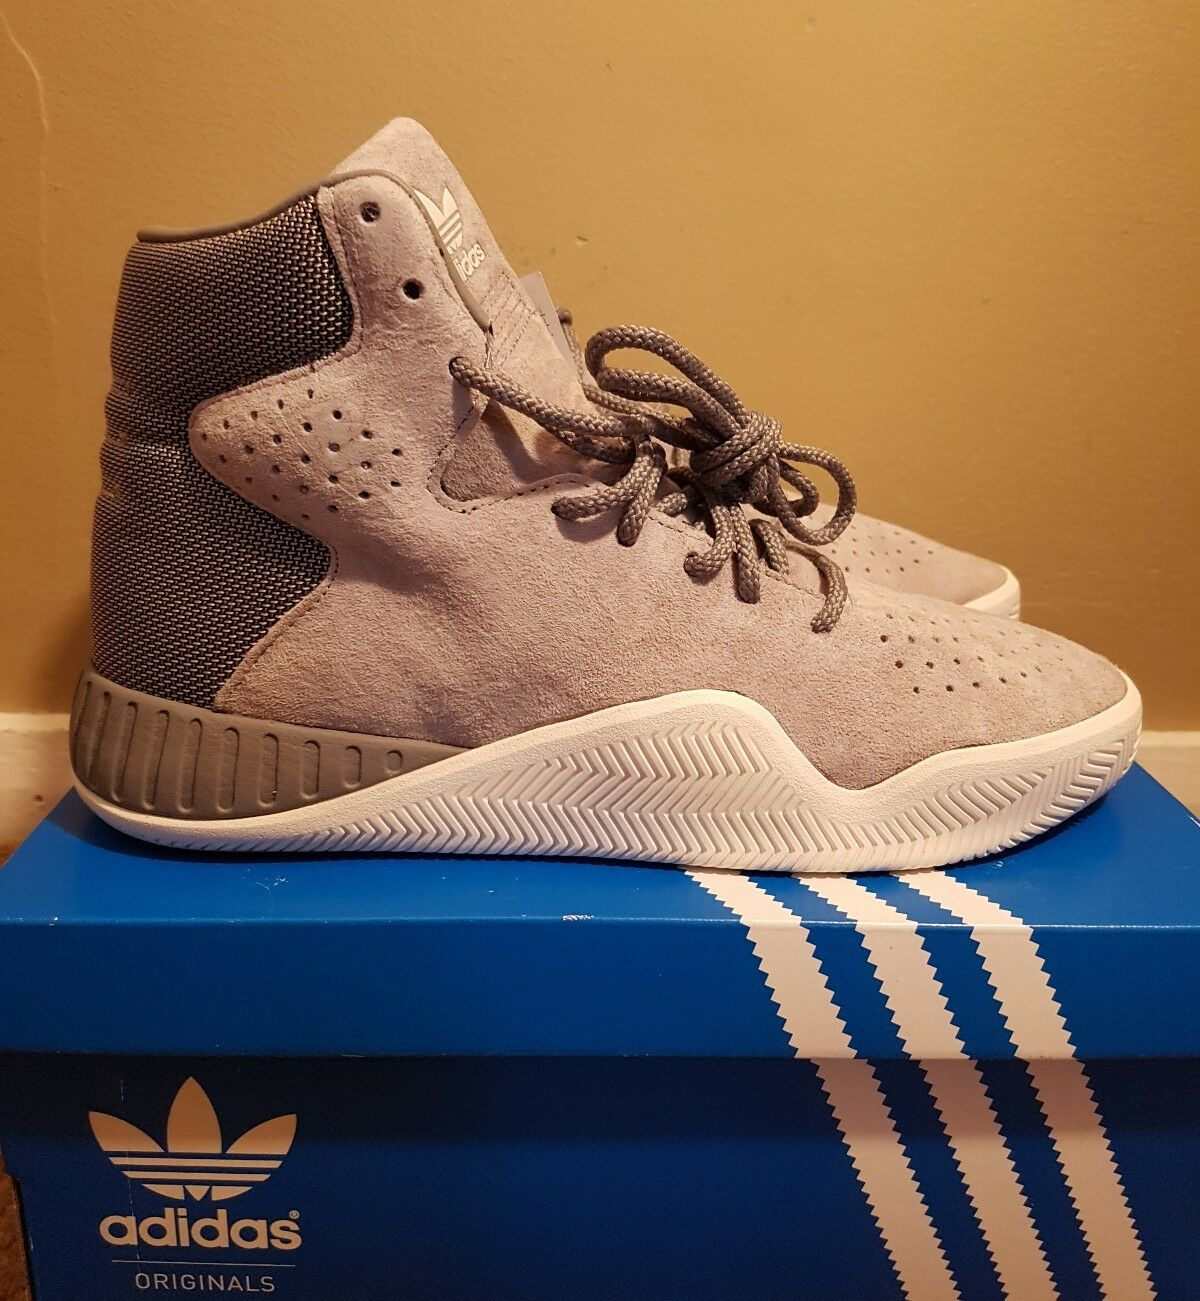 Adidas Tubular Instinct Size 5.5 S76171